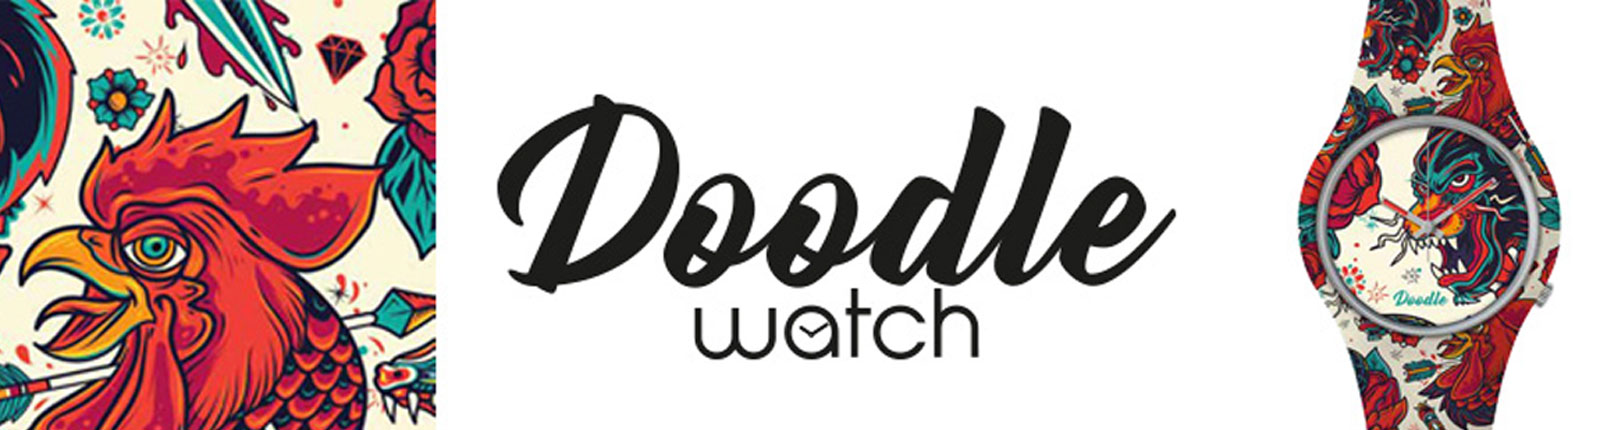 Doodle-Banner